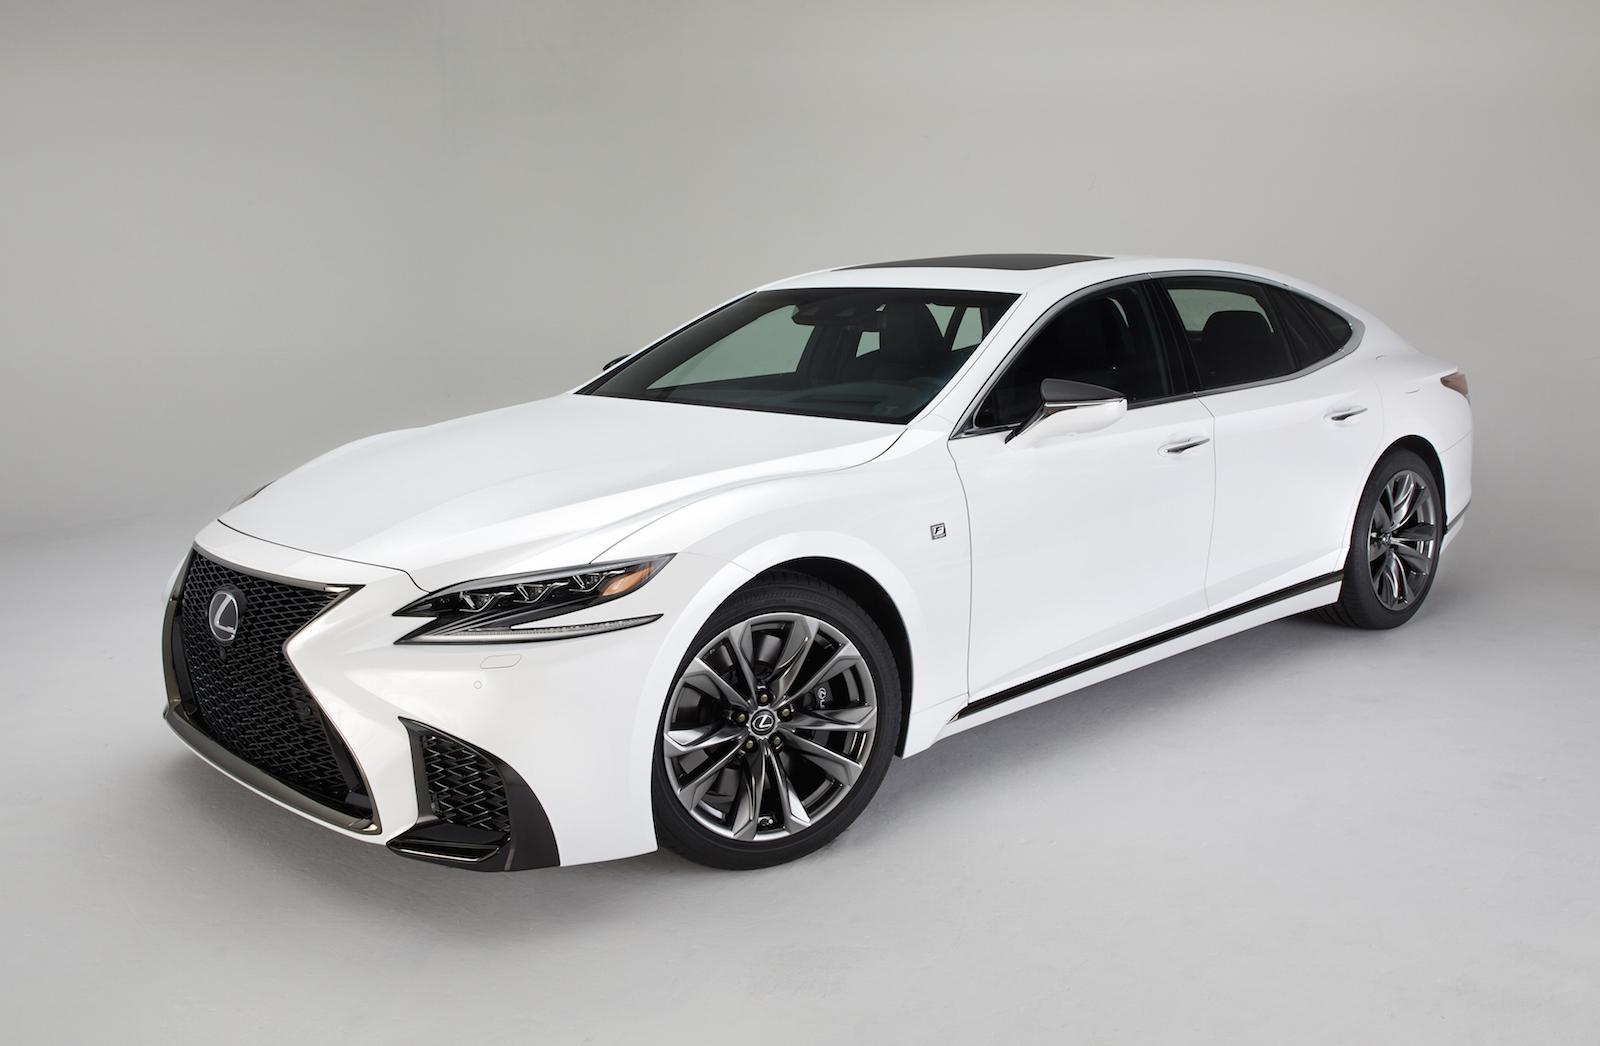 Kia Company Latest Models >> 2018 Lexus LS F Sport pack revealed, looks hot | PerformanceDrive